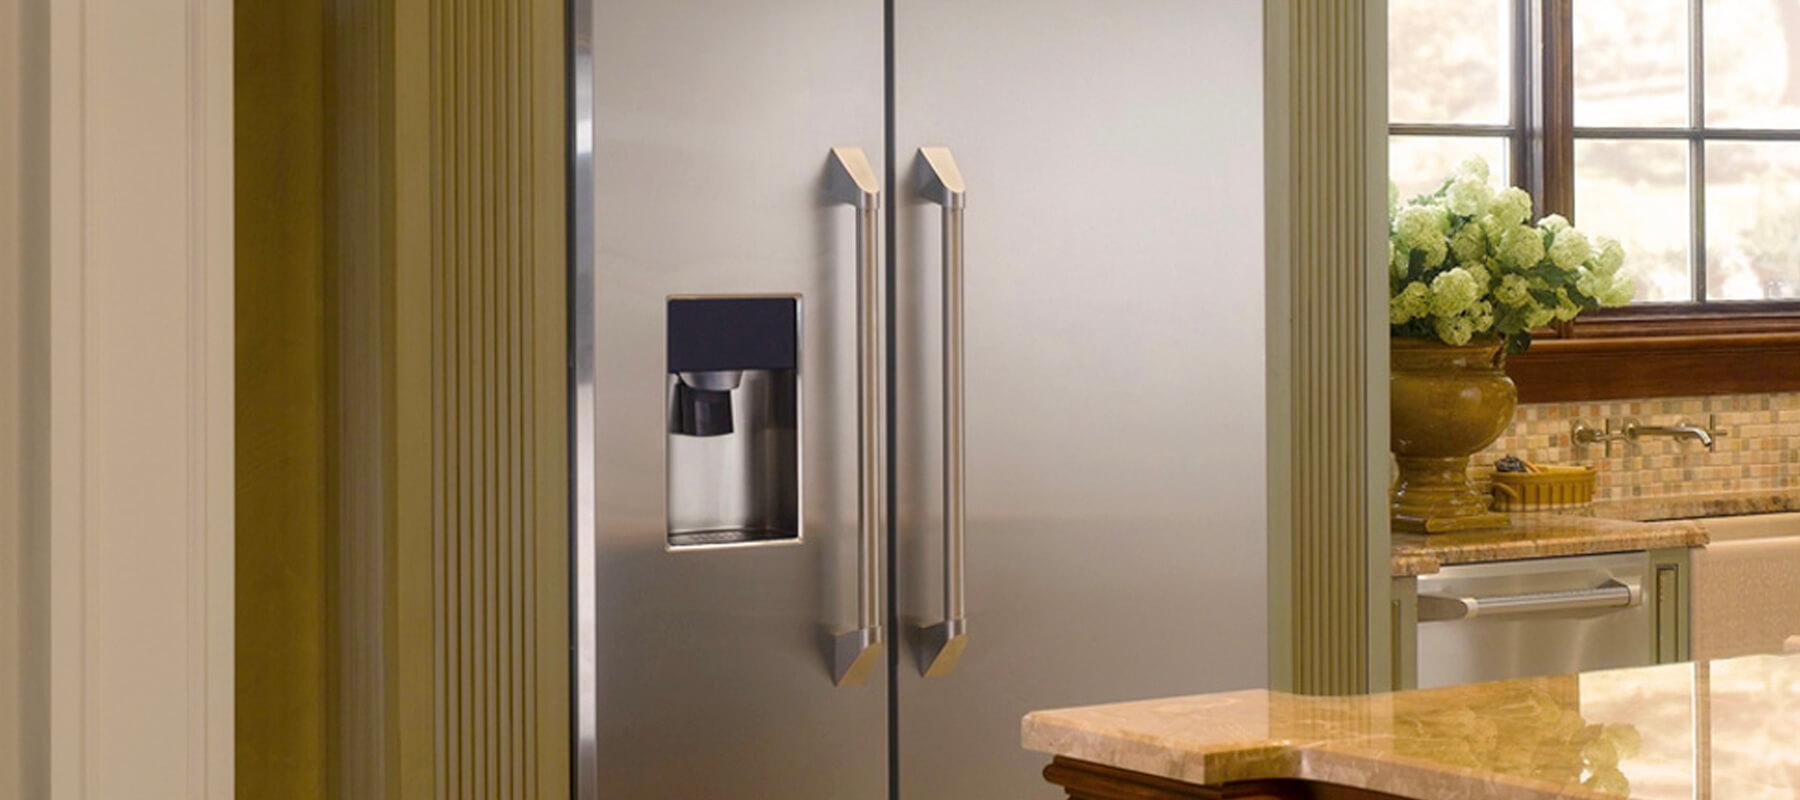 Built in Counter Depth Refrigerator San Francisco | Built-in Refrigerator Repair